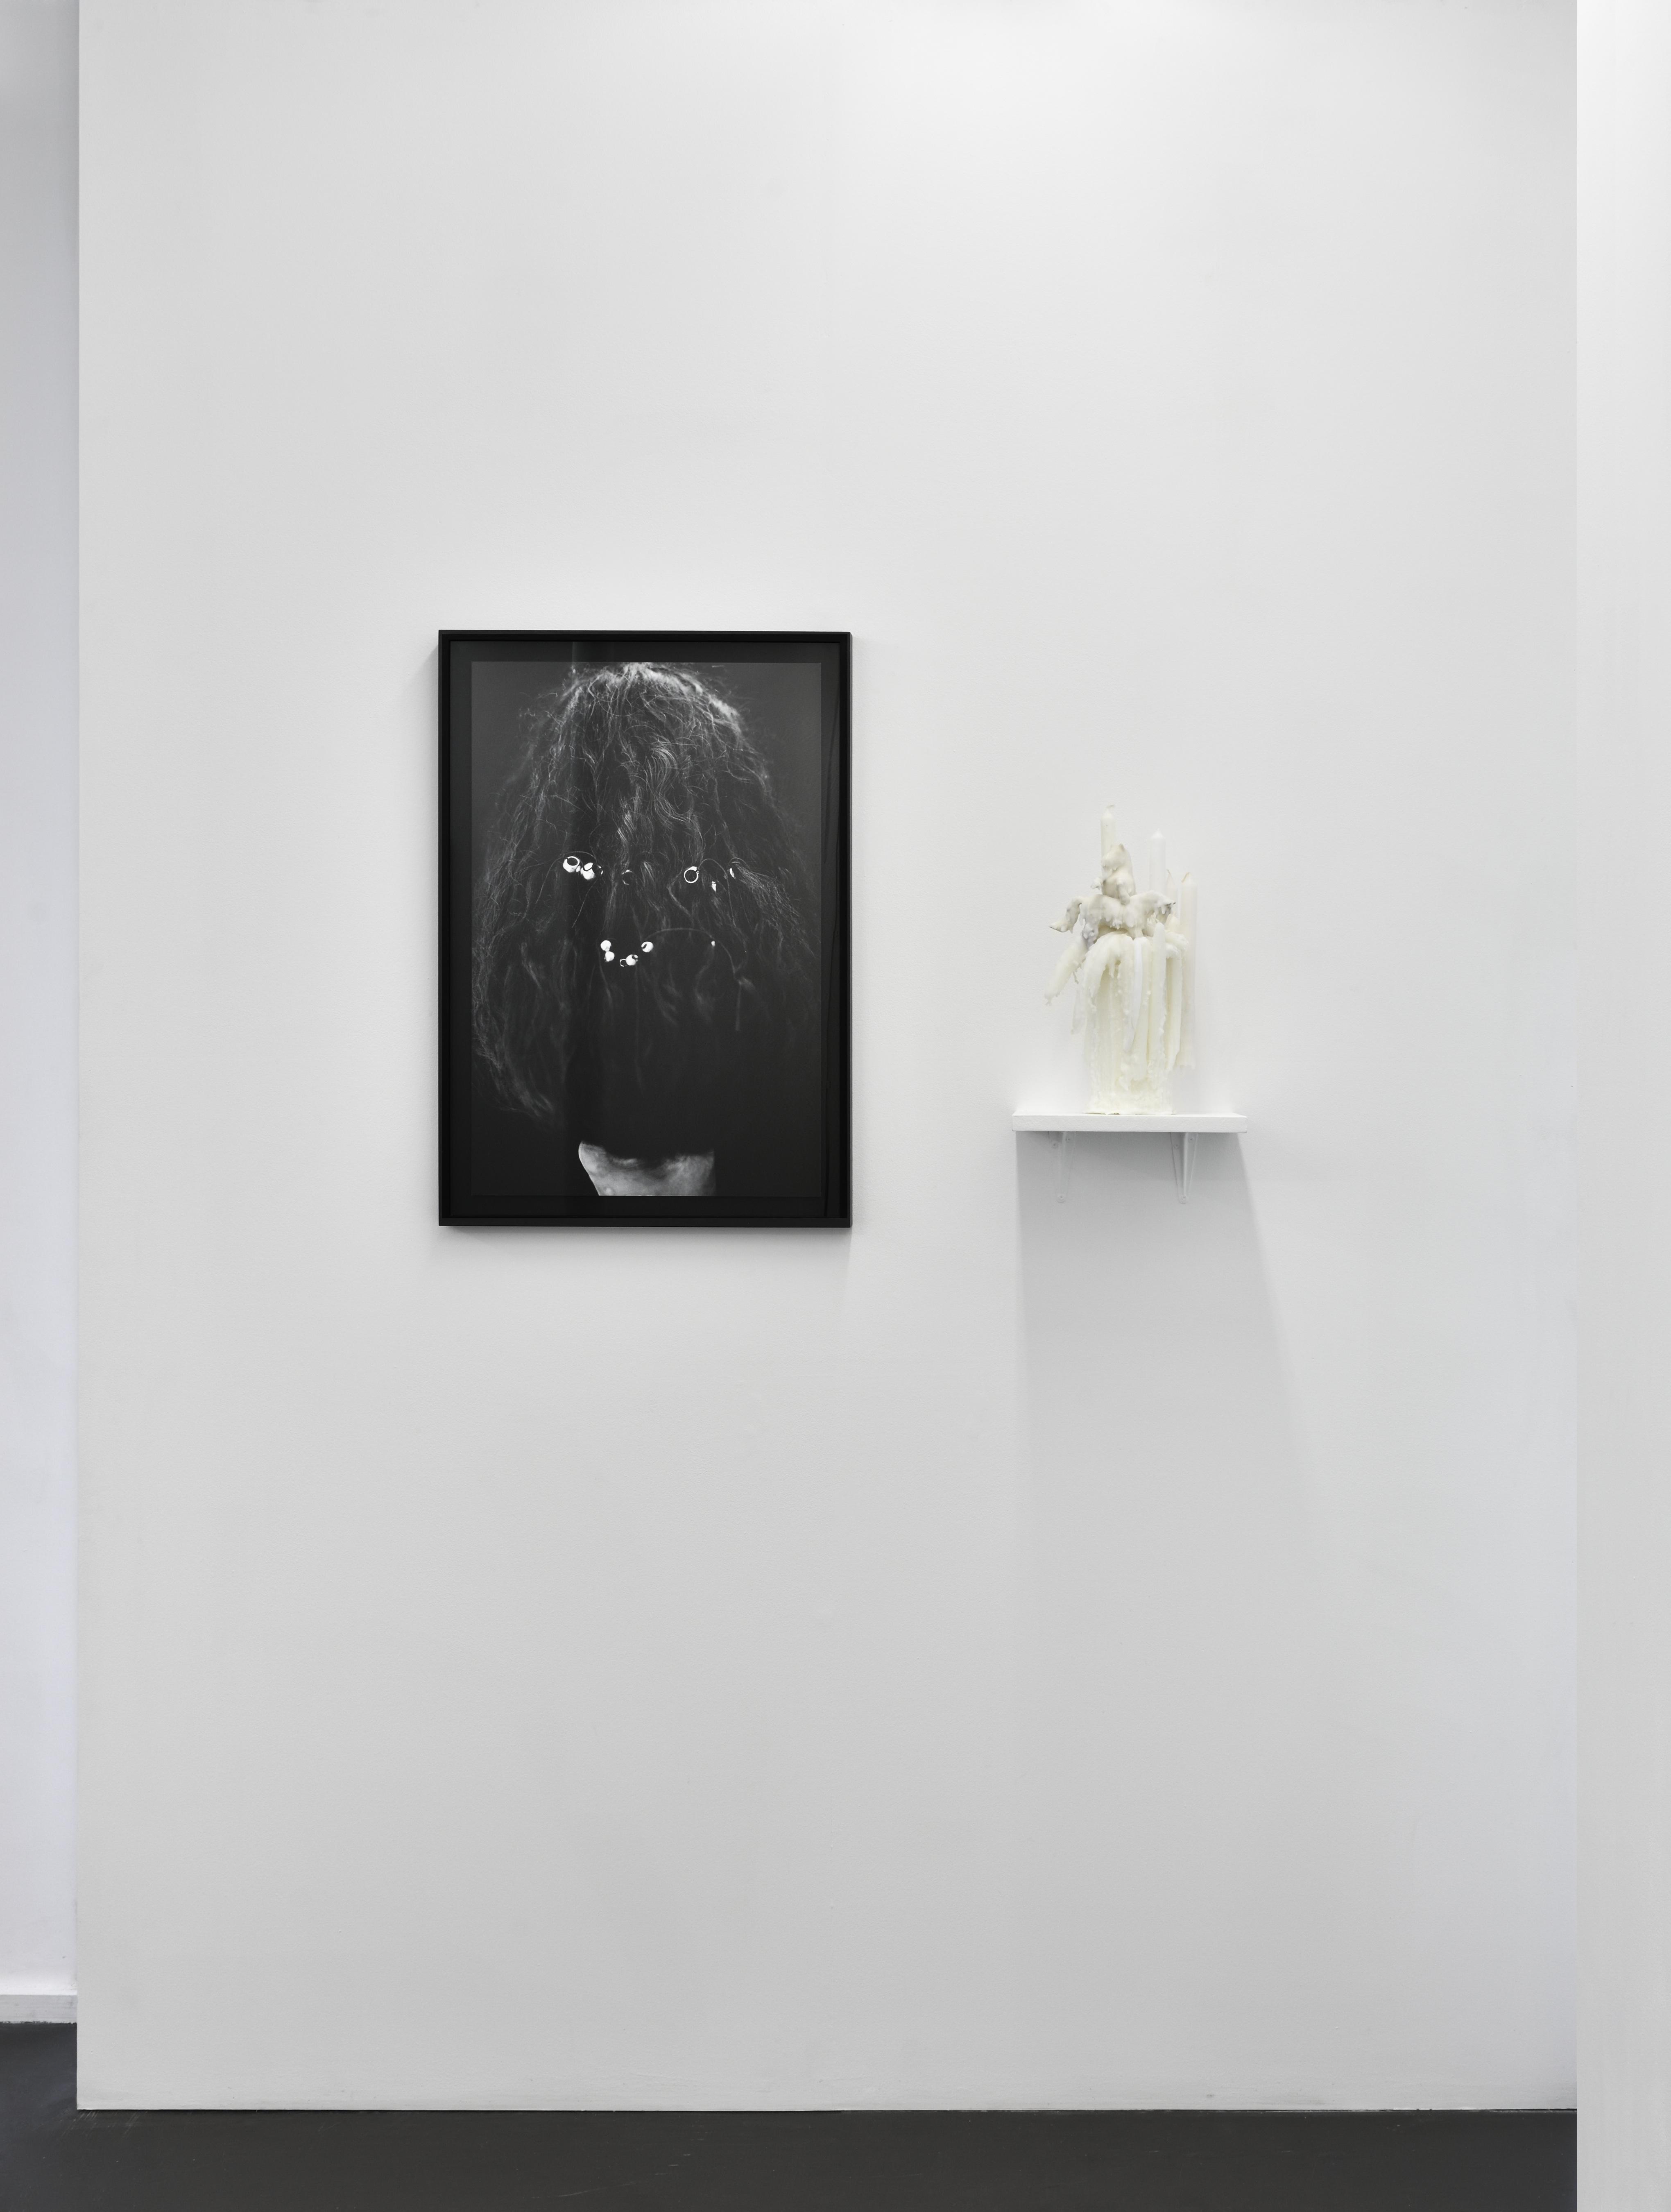 Vue de l'exposition HOSTIE, 2017 - Galerie Maïa Muller ©Rebecca Fanuele